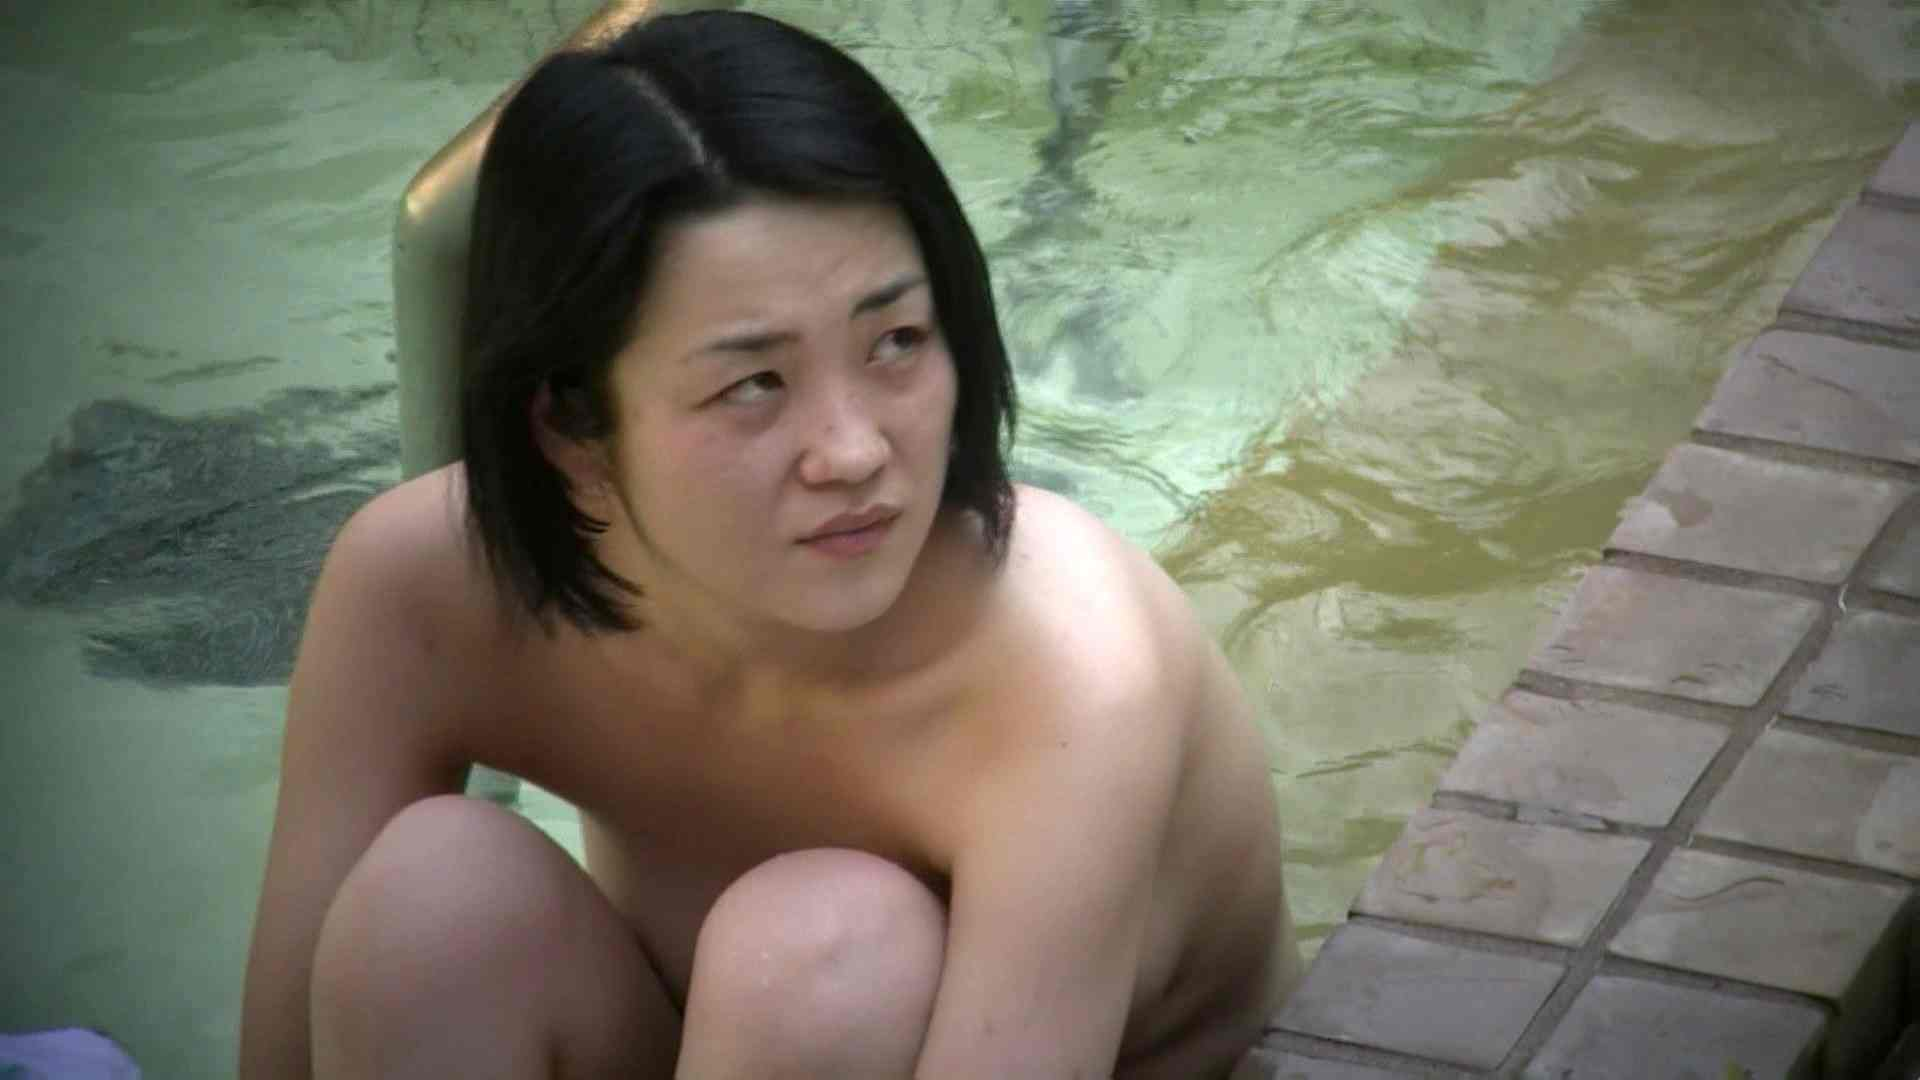 Aquaな露天風呂Vol.651 盗撮師作品 エロ無料画像 74pic 53